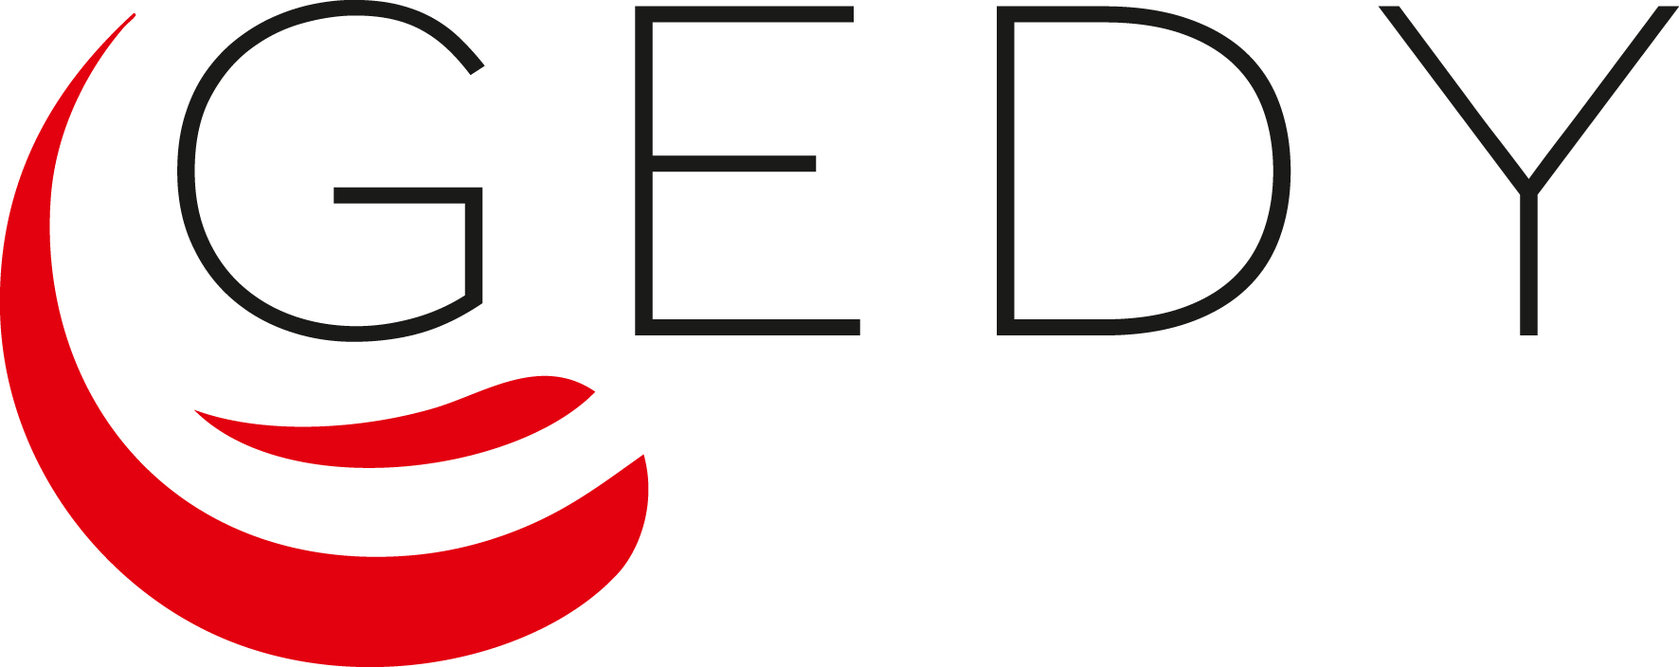 Gedy Edera WC Brush Set Free Standing in Chrome ED34-13